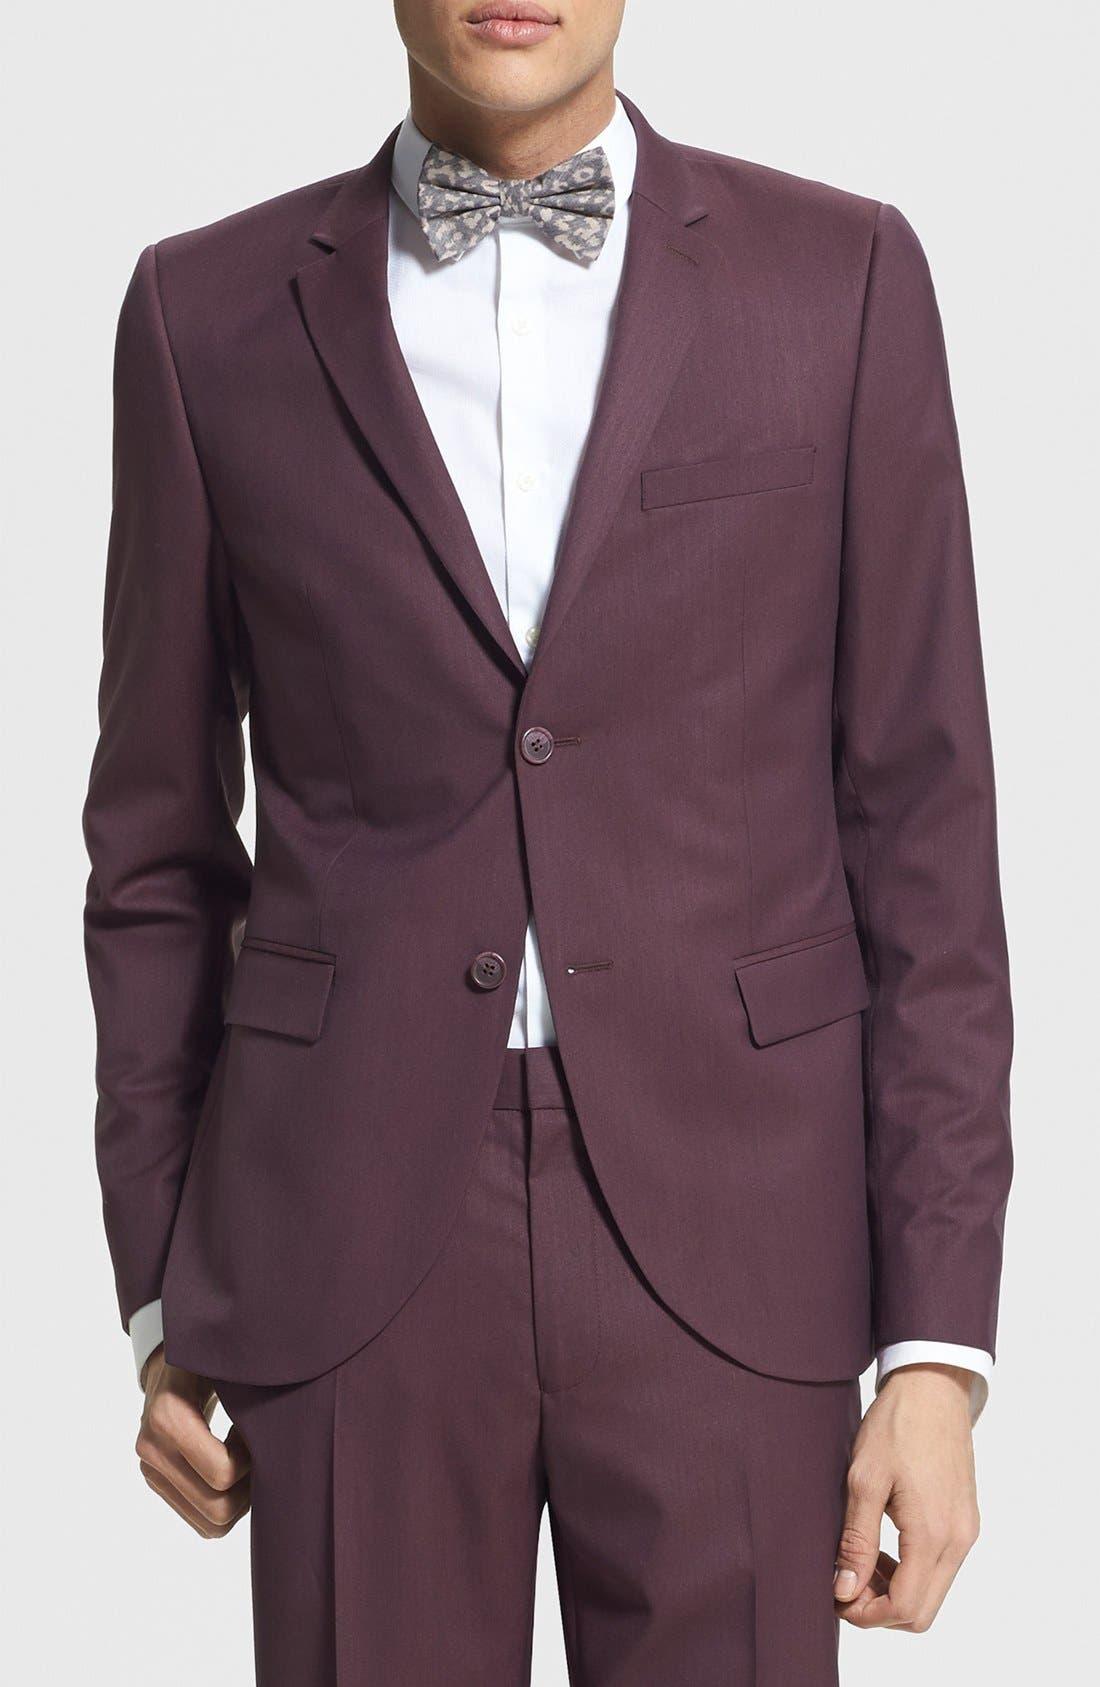 Main Image - Topman Skinny Fit Burgundy Suit Jacket